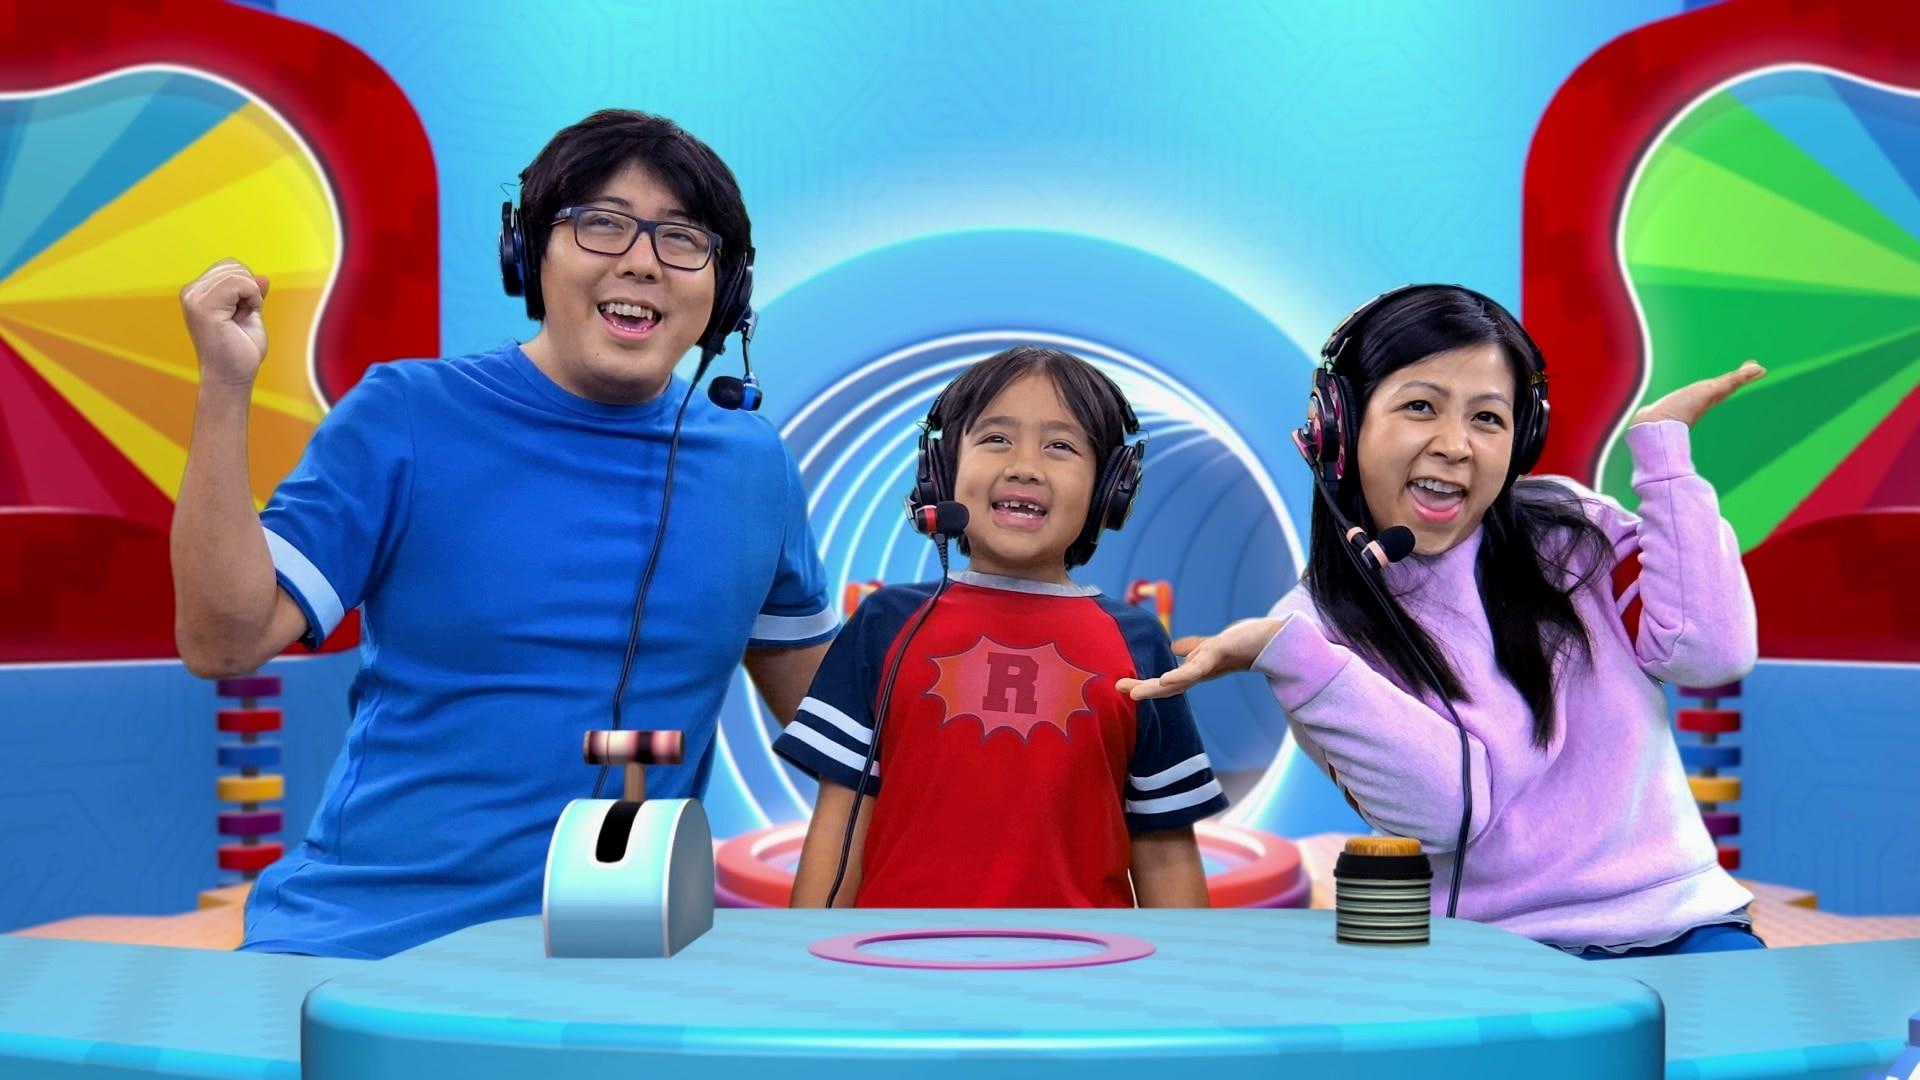 Ryan's Yo-Ho-Ho Playdate / Ryan's Full Swing Playdate